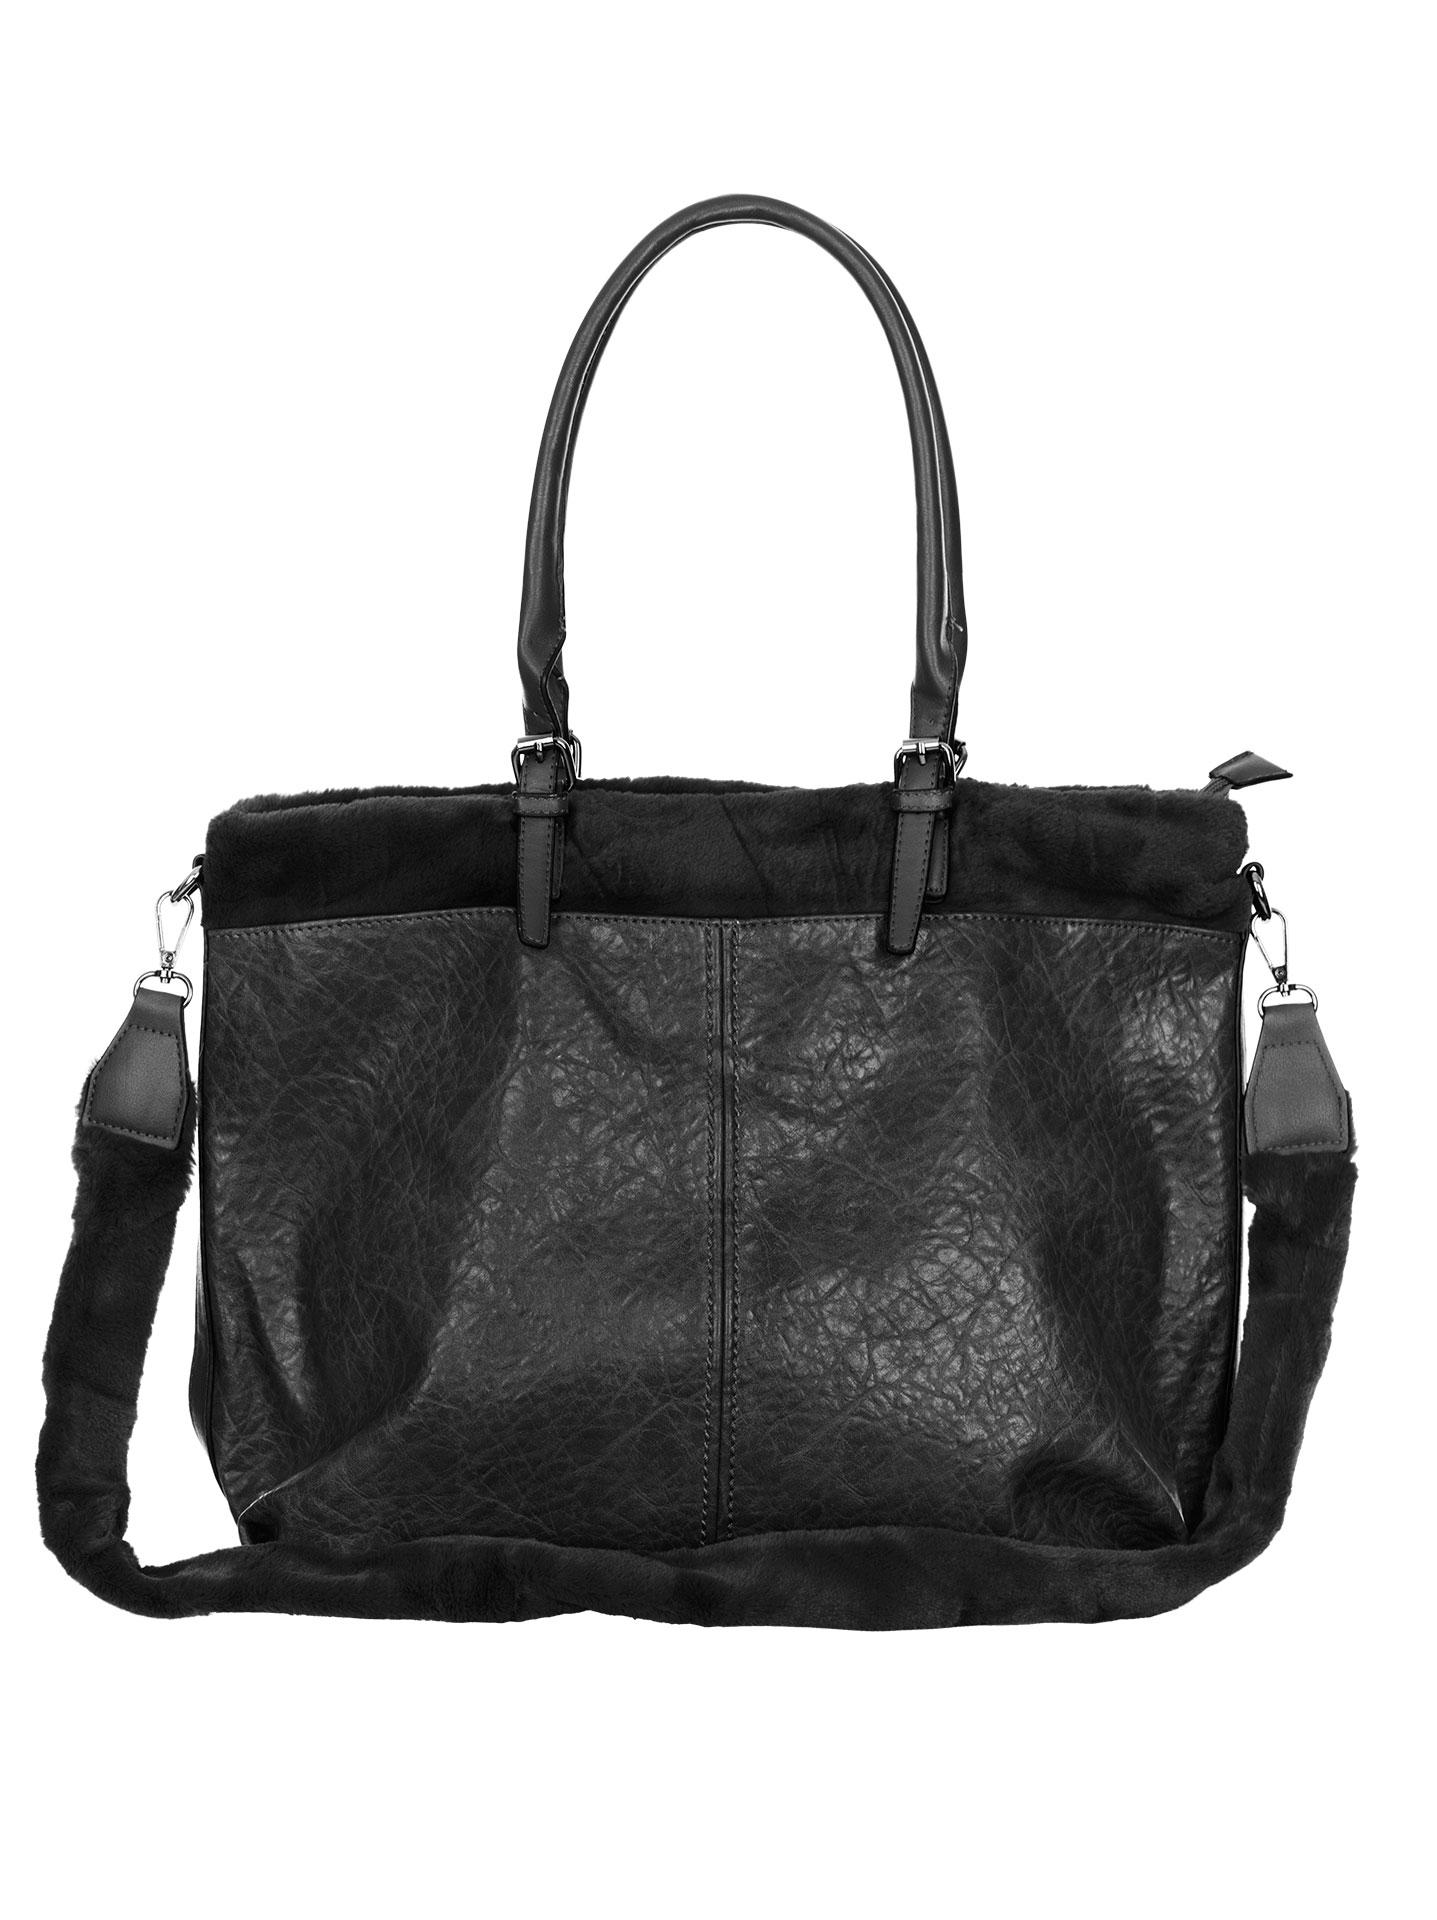 bee94609301f Τσάντα με λεπτομέρεια συνθετικής γούνας μαυρο